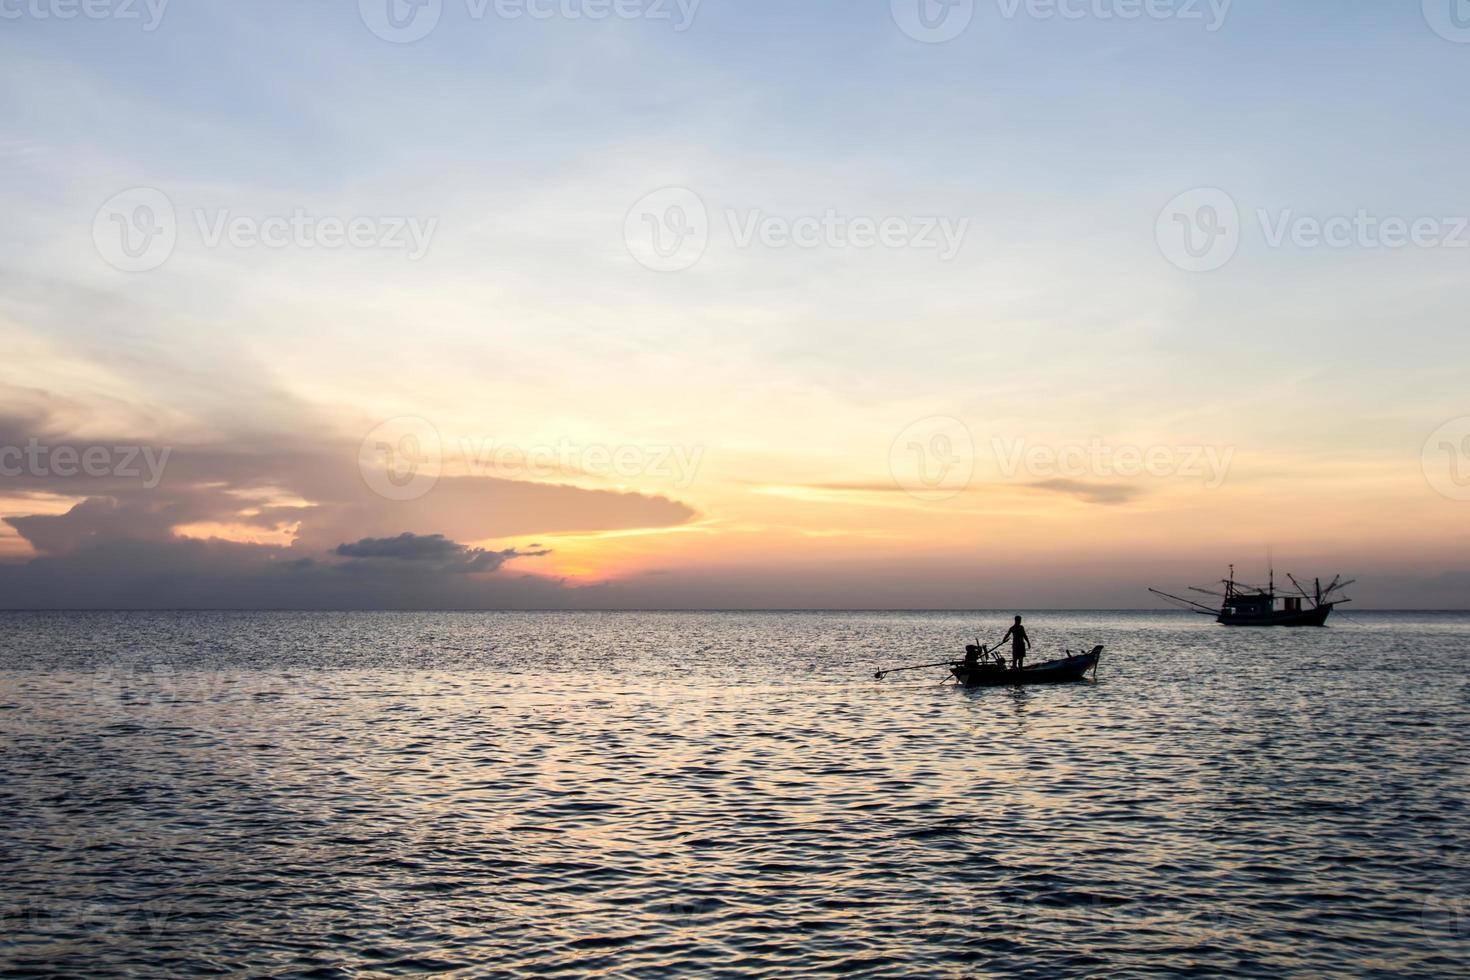 barca a coda lunga e tramonto in mare, Koh Phangan, Surat Thani foto